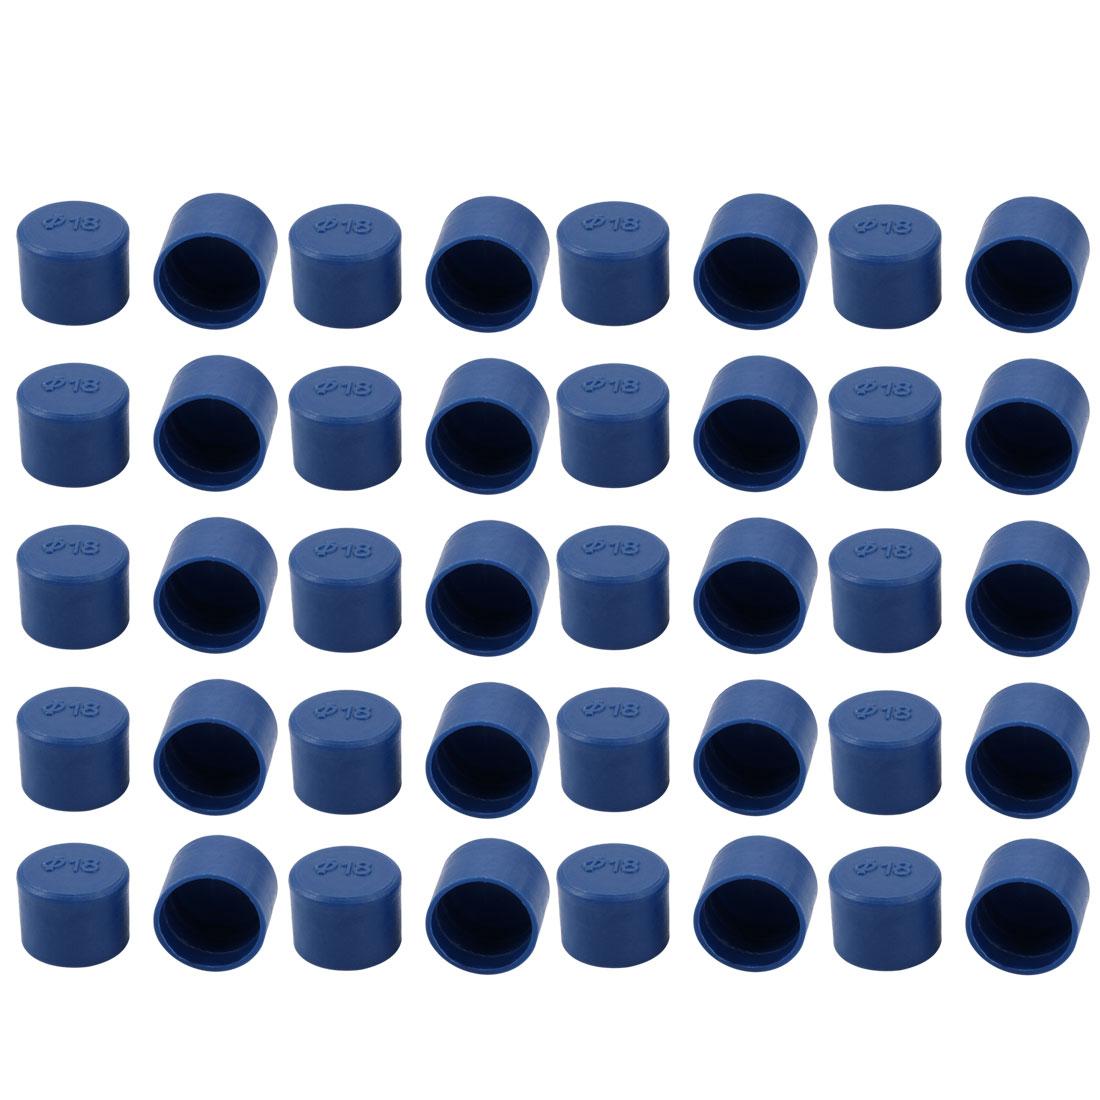 40pcs 18mm Inner Dia PE Plastic End Cap Bolt Thread Protector Tube Cover Blue